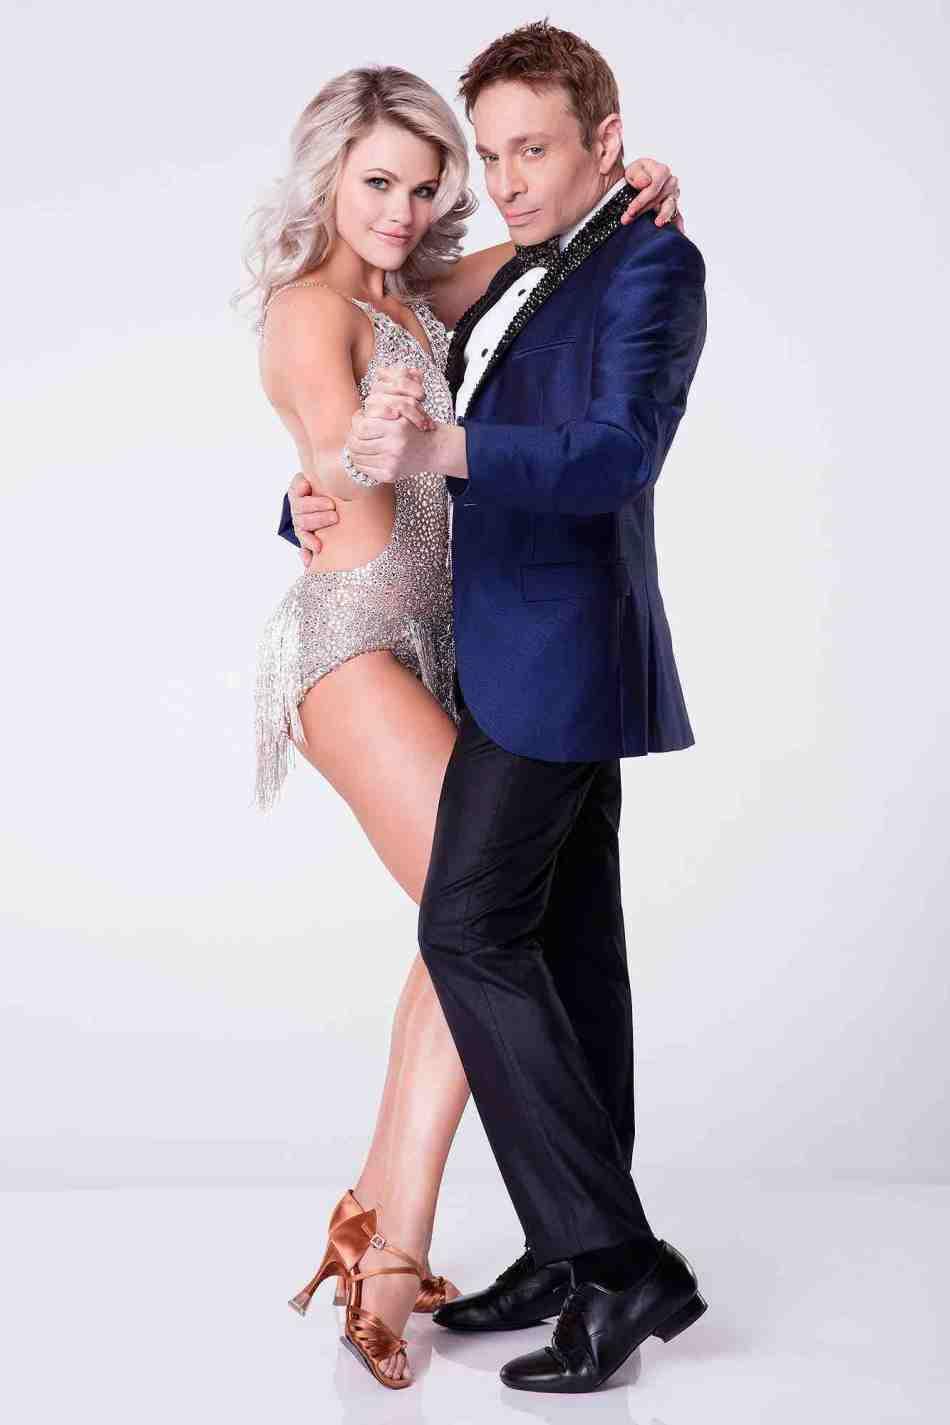 carson-kattan Dancing with thhe stars 2017